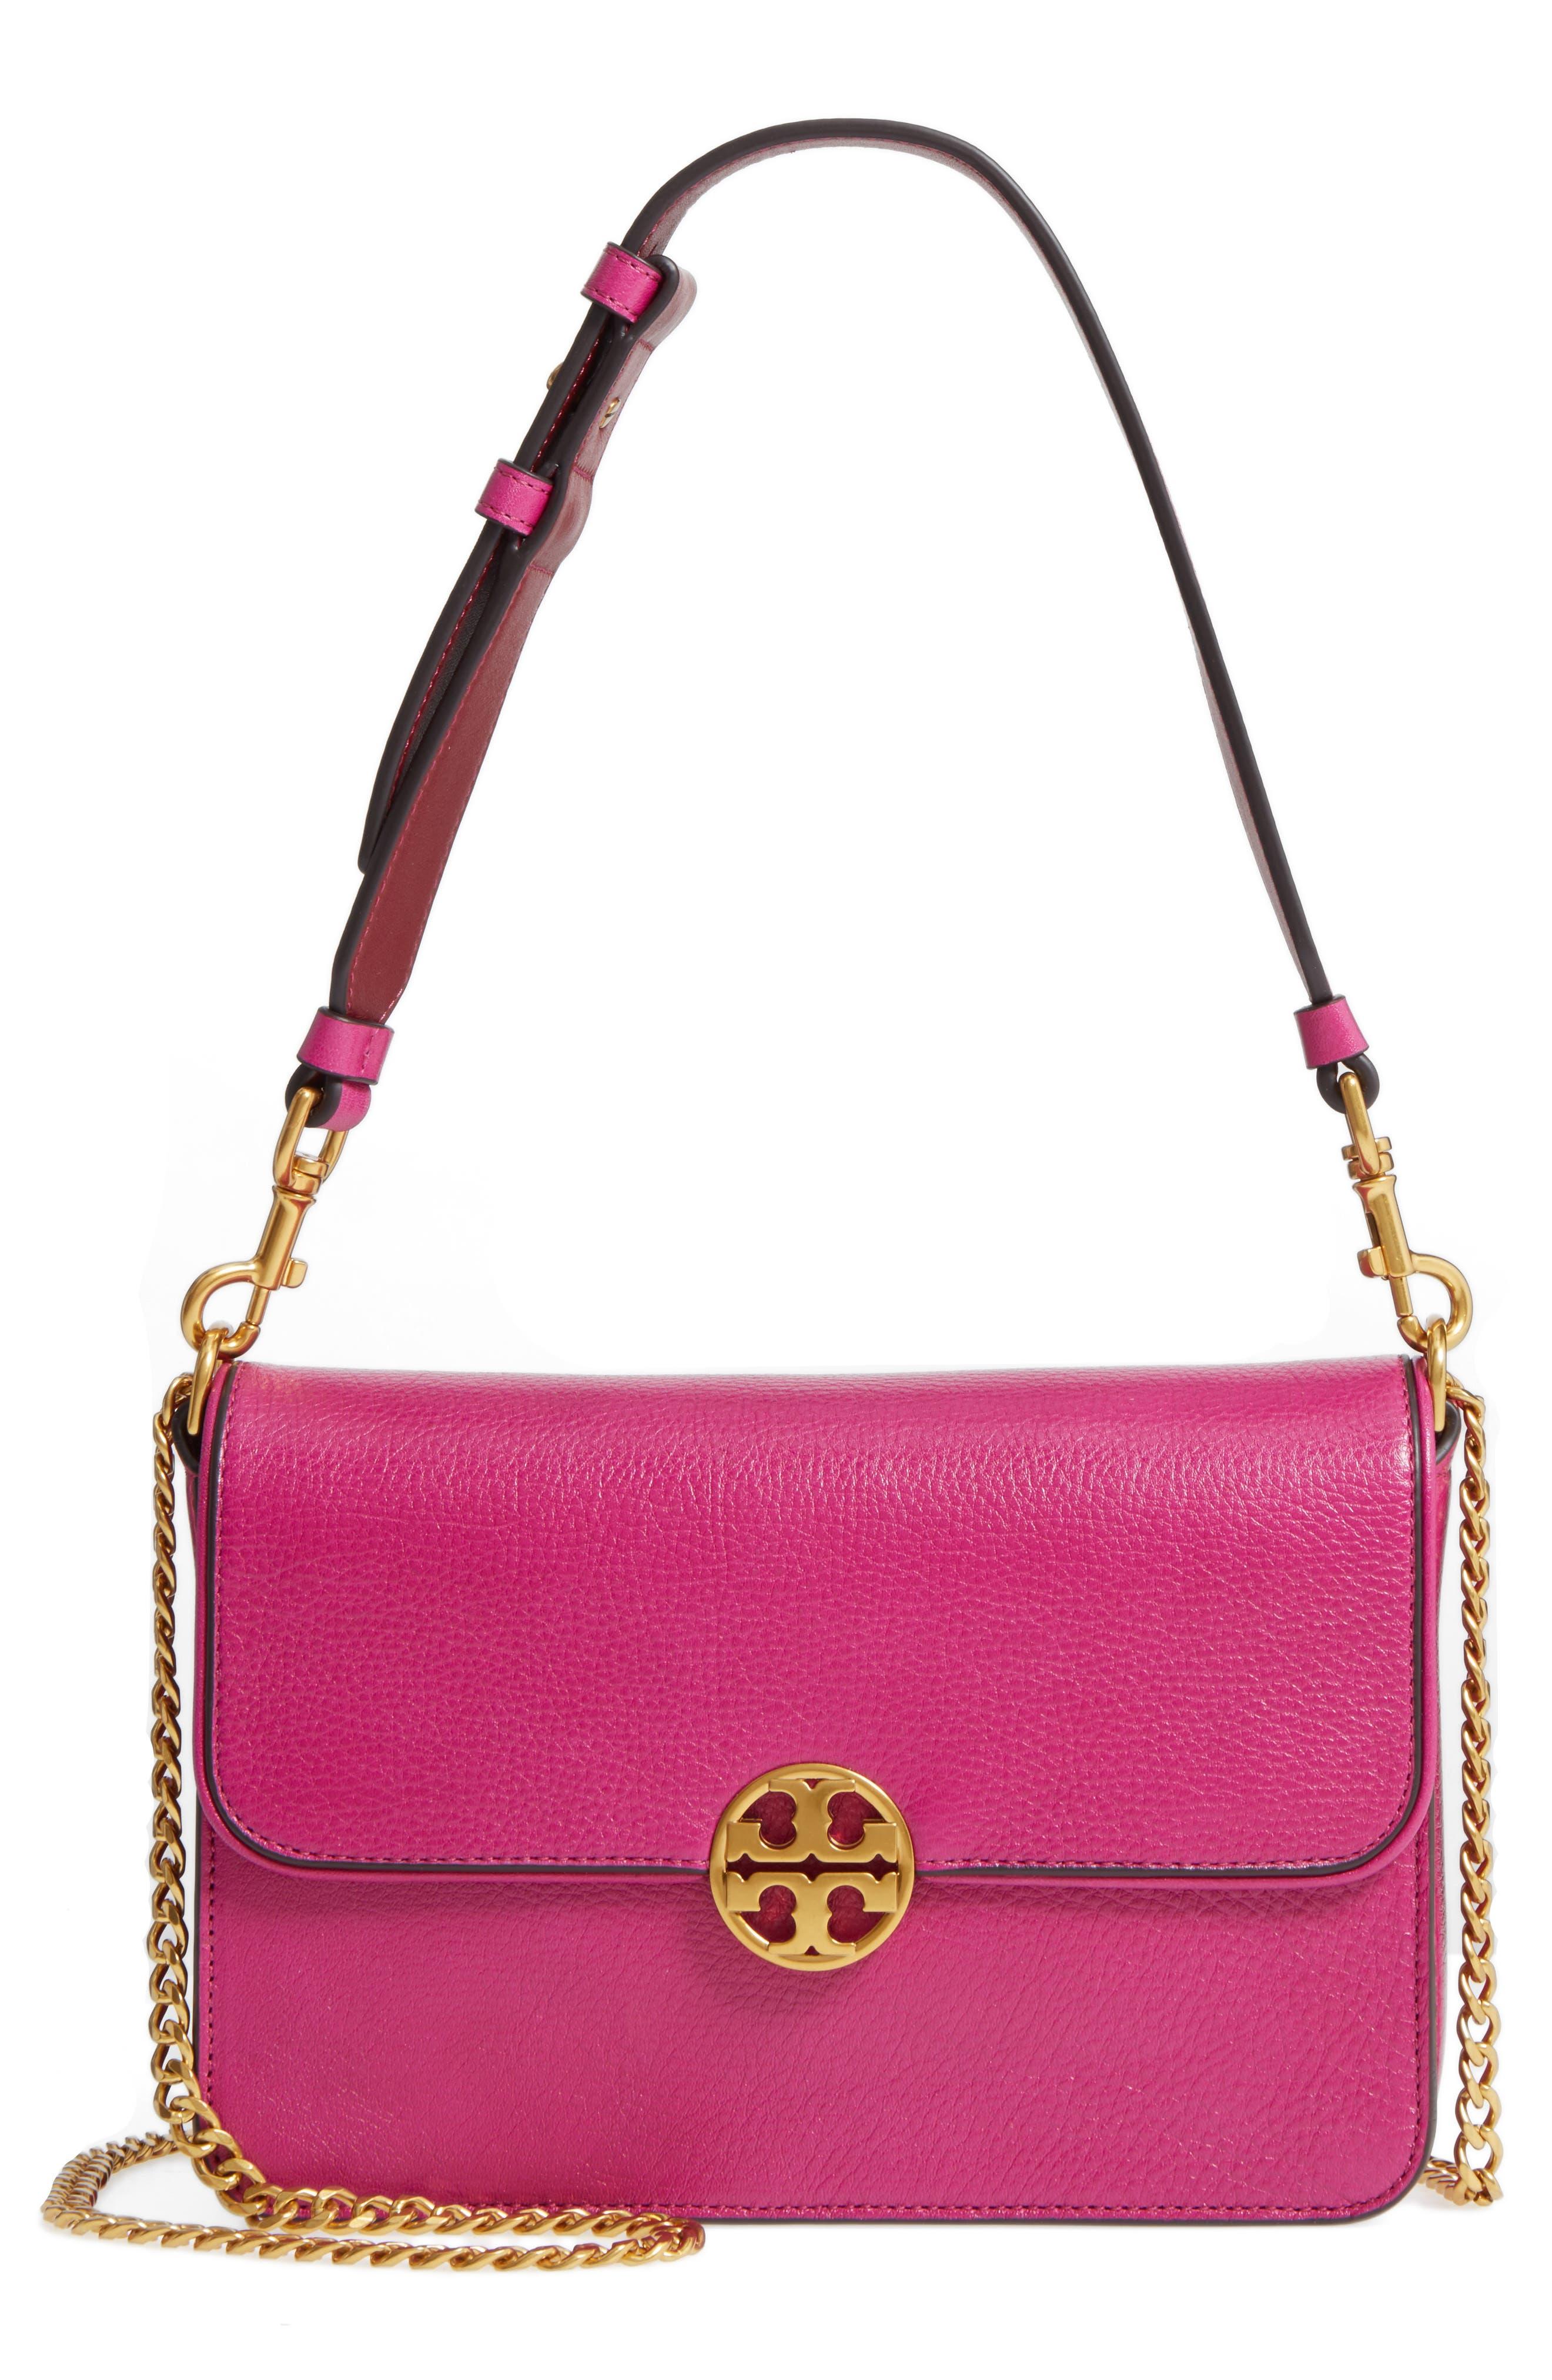 Chelsea Genuine Leather Shoulder Bag,                             Main thumbnail 1, color,                             650